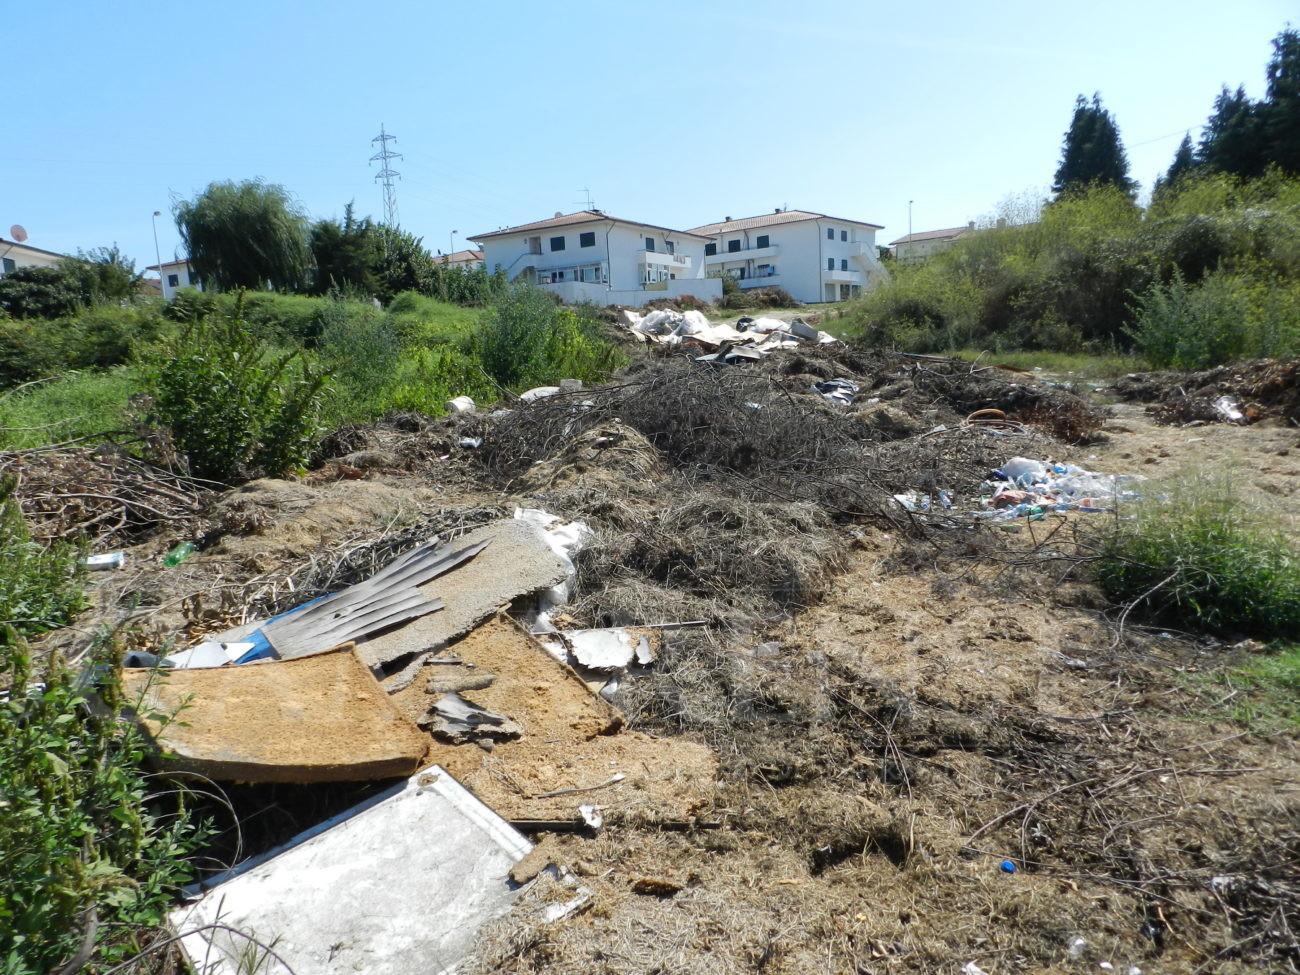 FERREIROS - Moradores indignados com o lixo depositado perto de casa